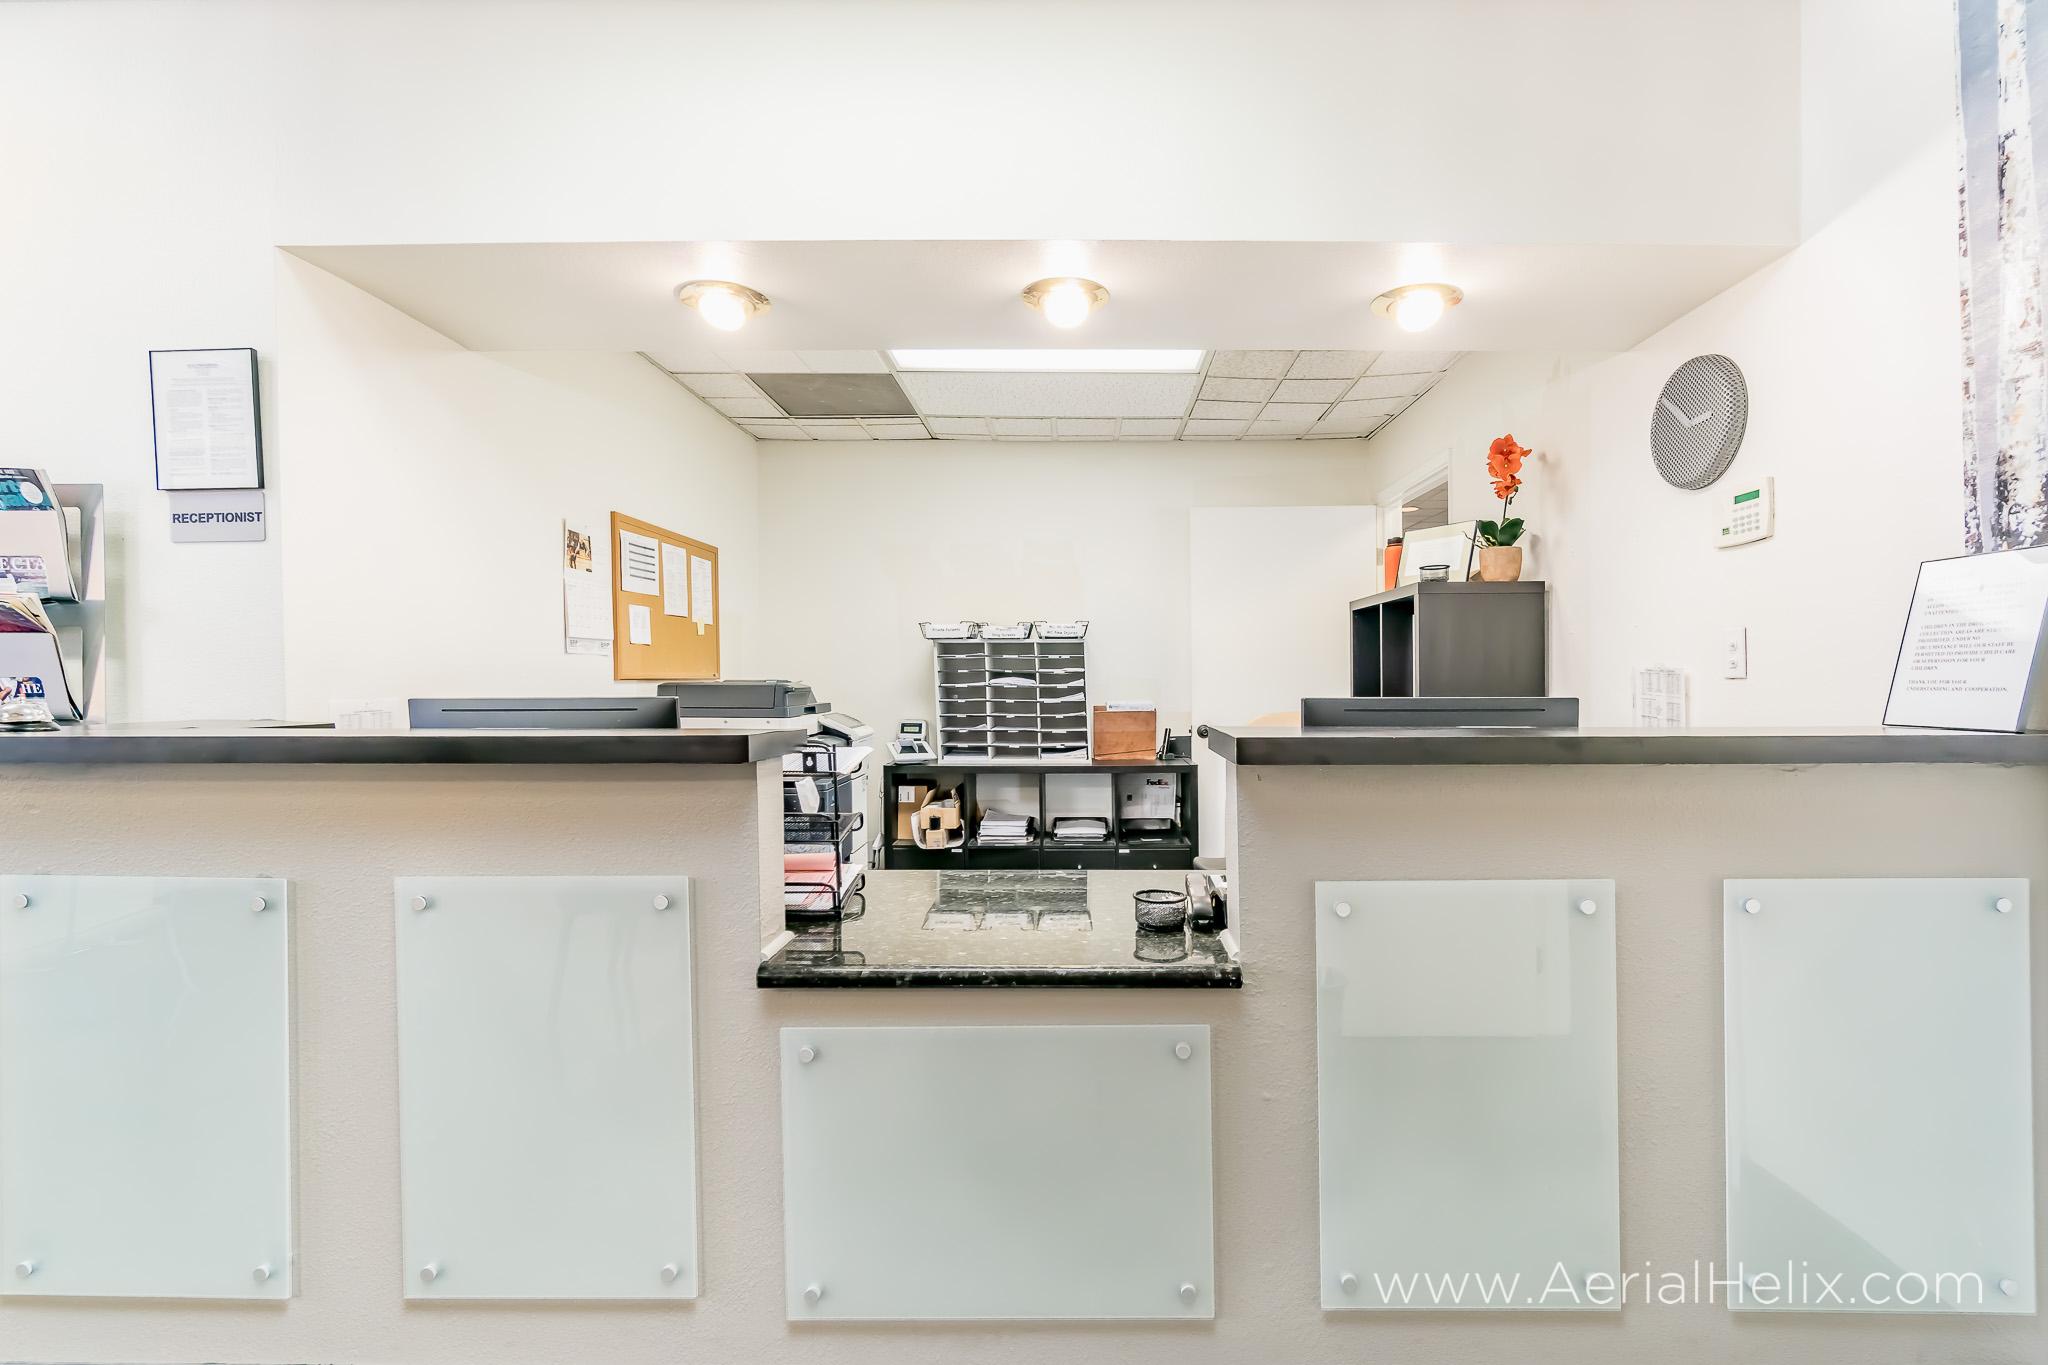 Garden Grove Medical Offices Commercial real estate photographer-39.jpg